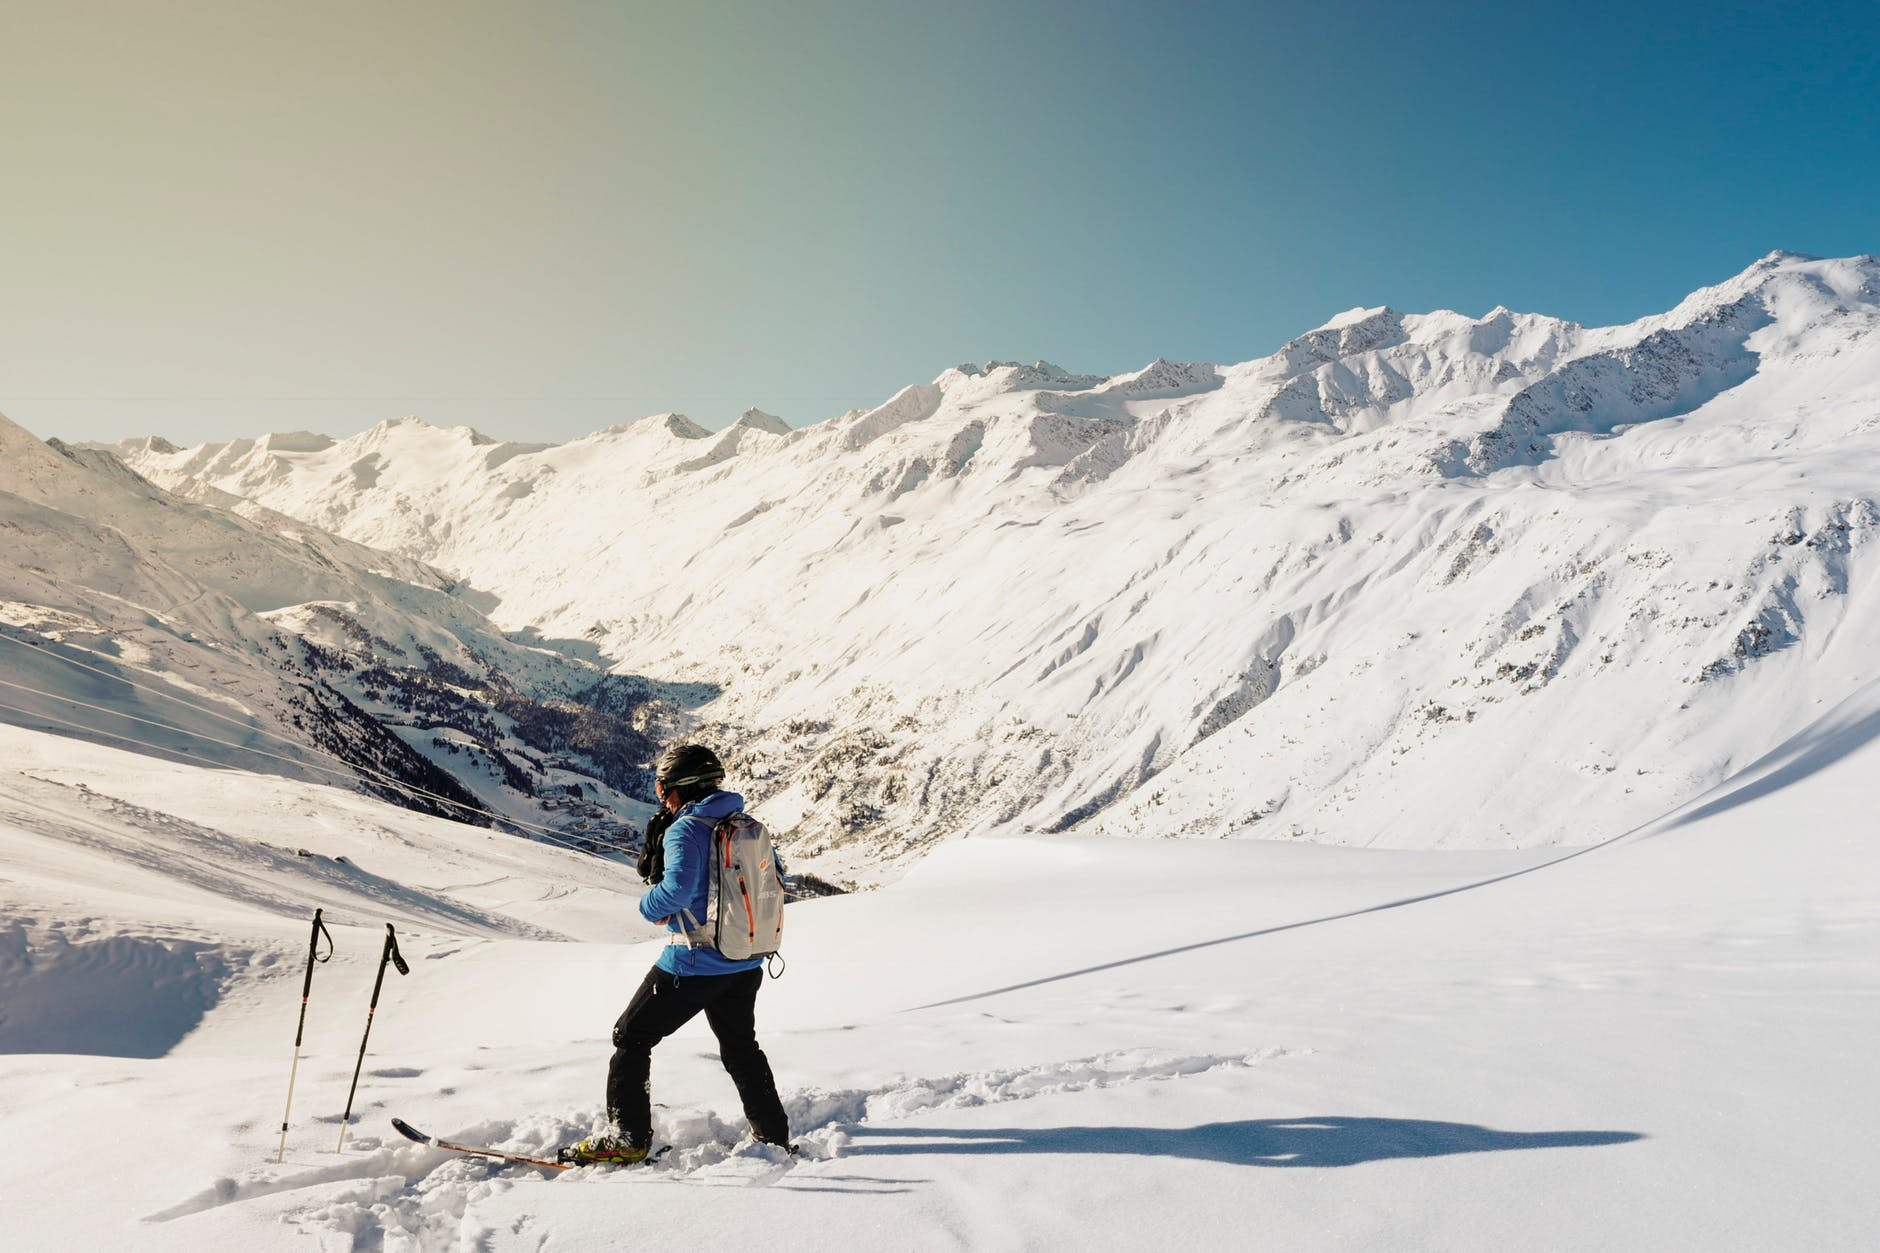 pistes de ski montagne hiver